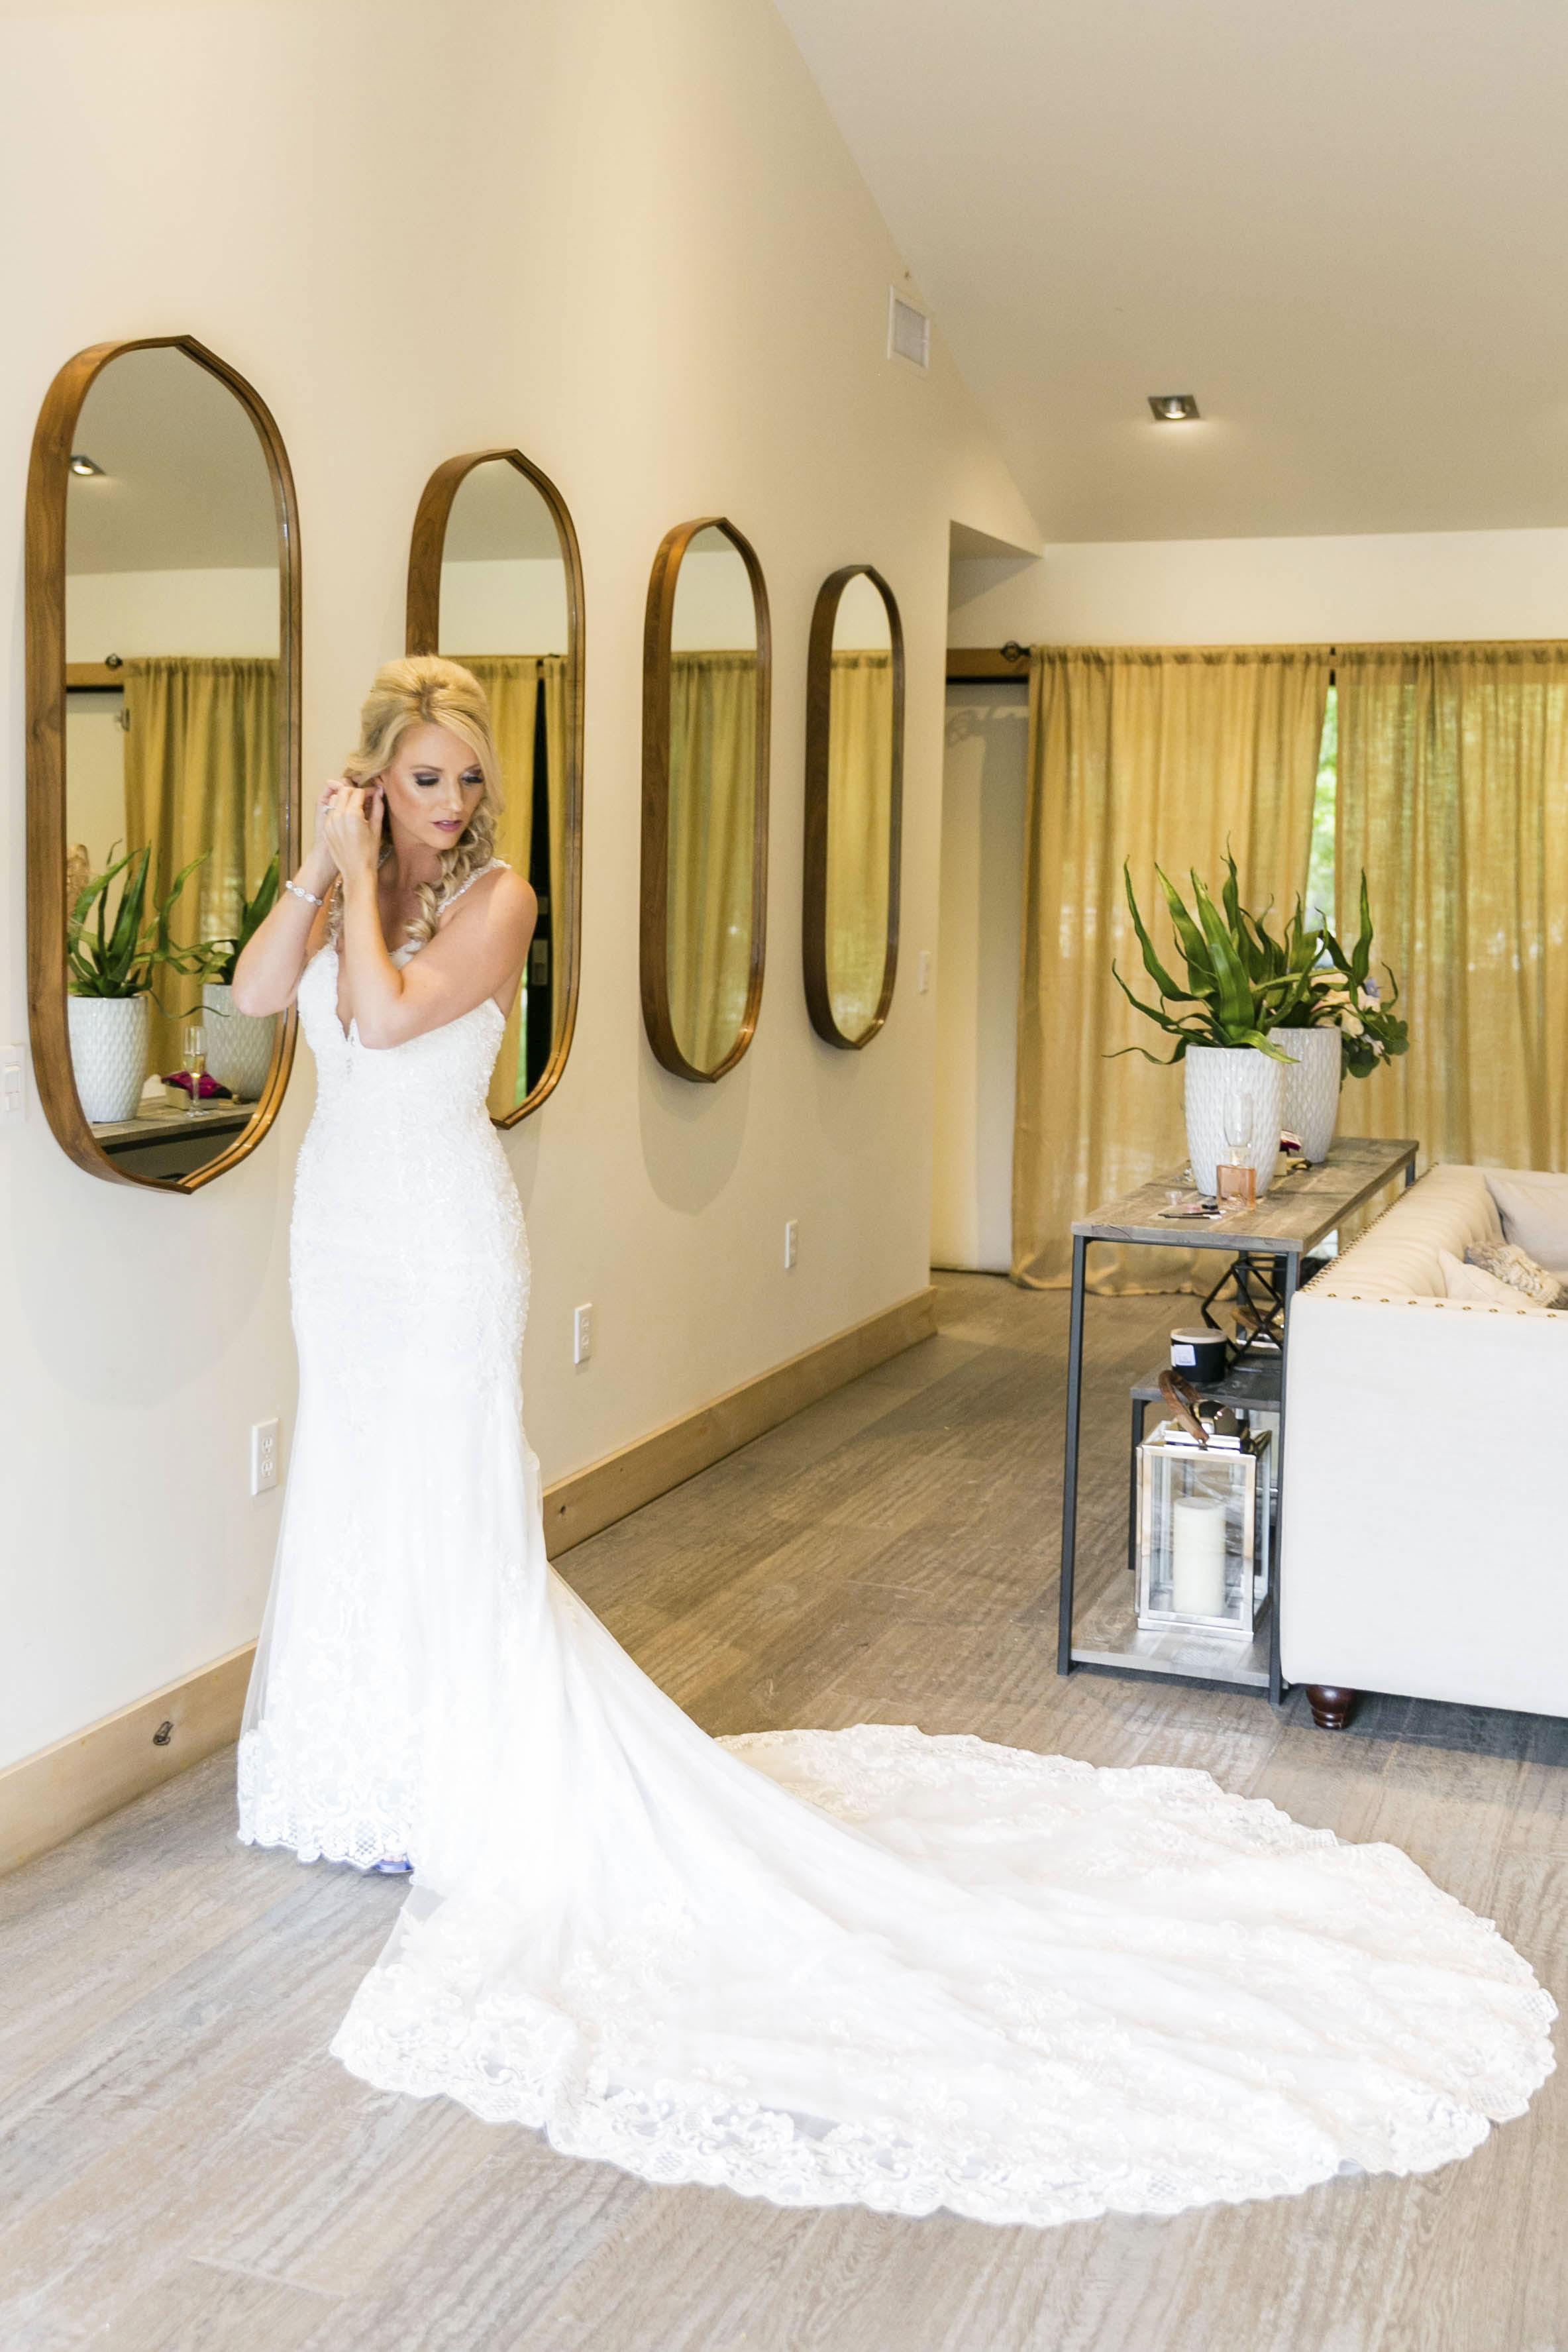 Domenica Beauty _ Hair and Makeup Artist _Wedding _ Temecula, CA Wedding _ Briana and Samuel _ 11.JPG